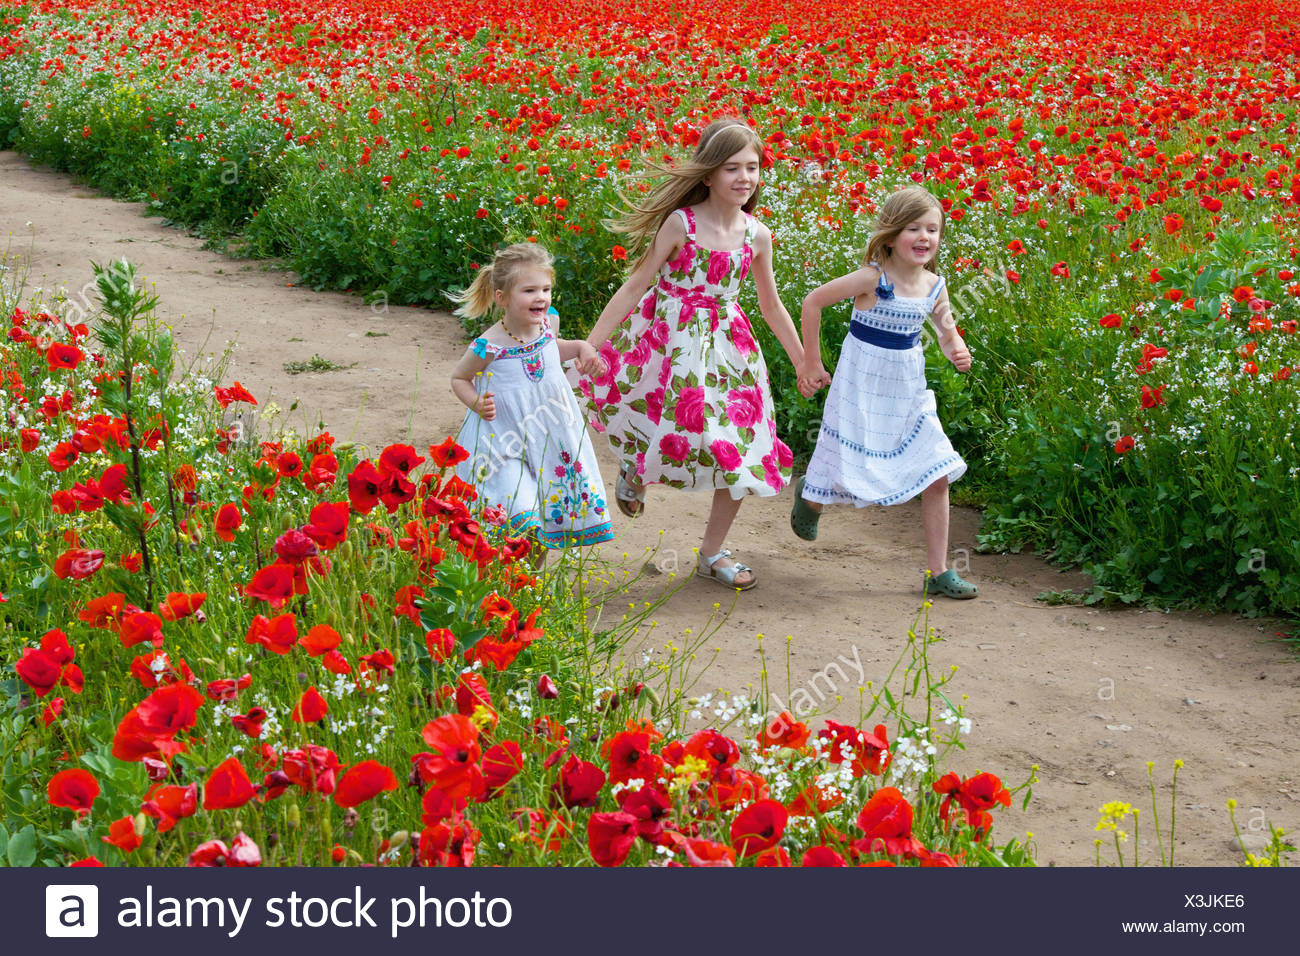 Girls running on dirt path - Stock Image